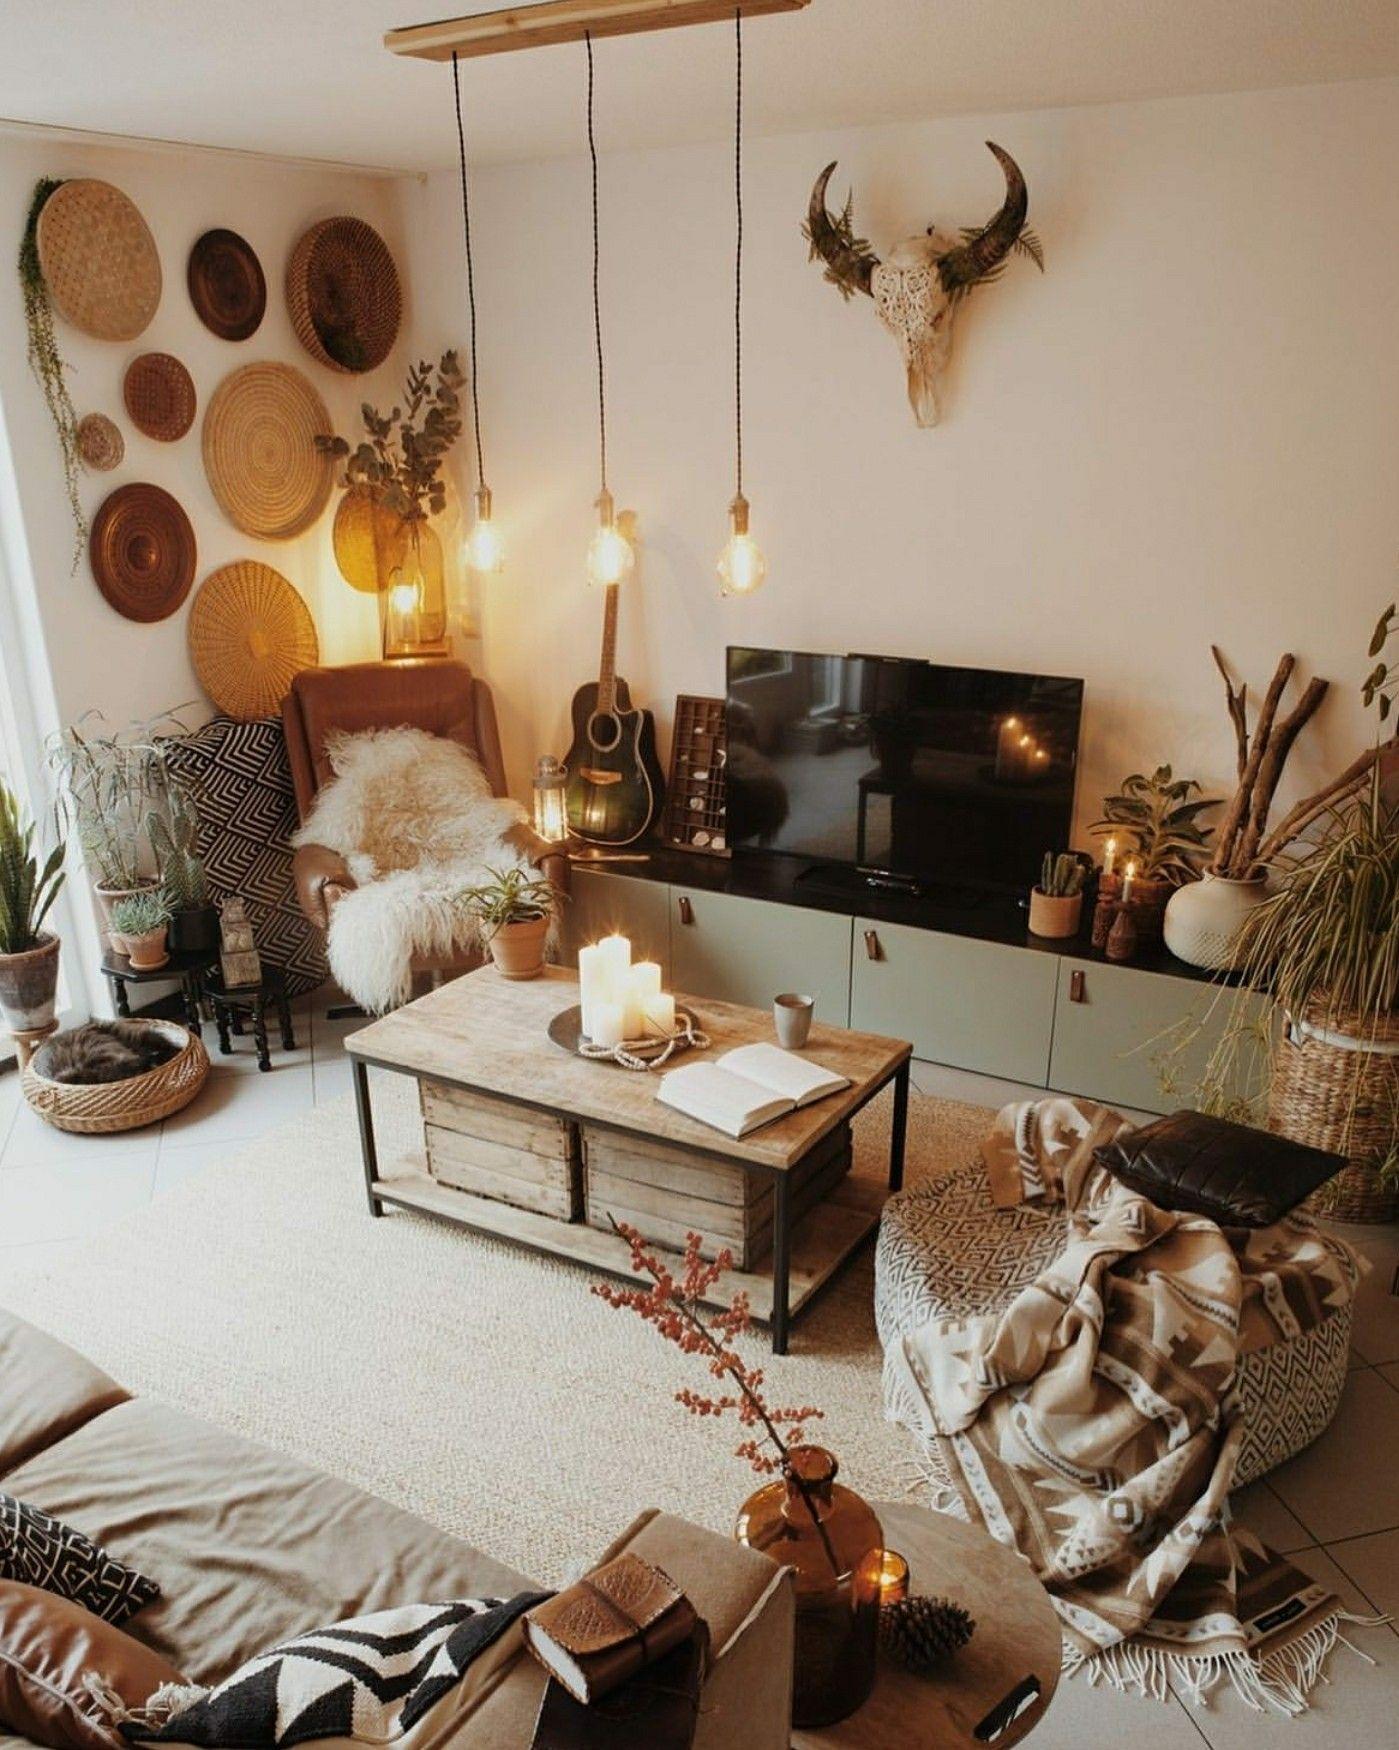 Minimalist Living Room Design Cozy Living Room Decor Cozy Living Room Colors Boho Interior Design Skull living room decor